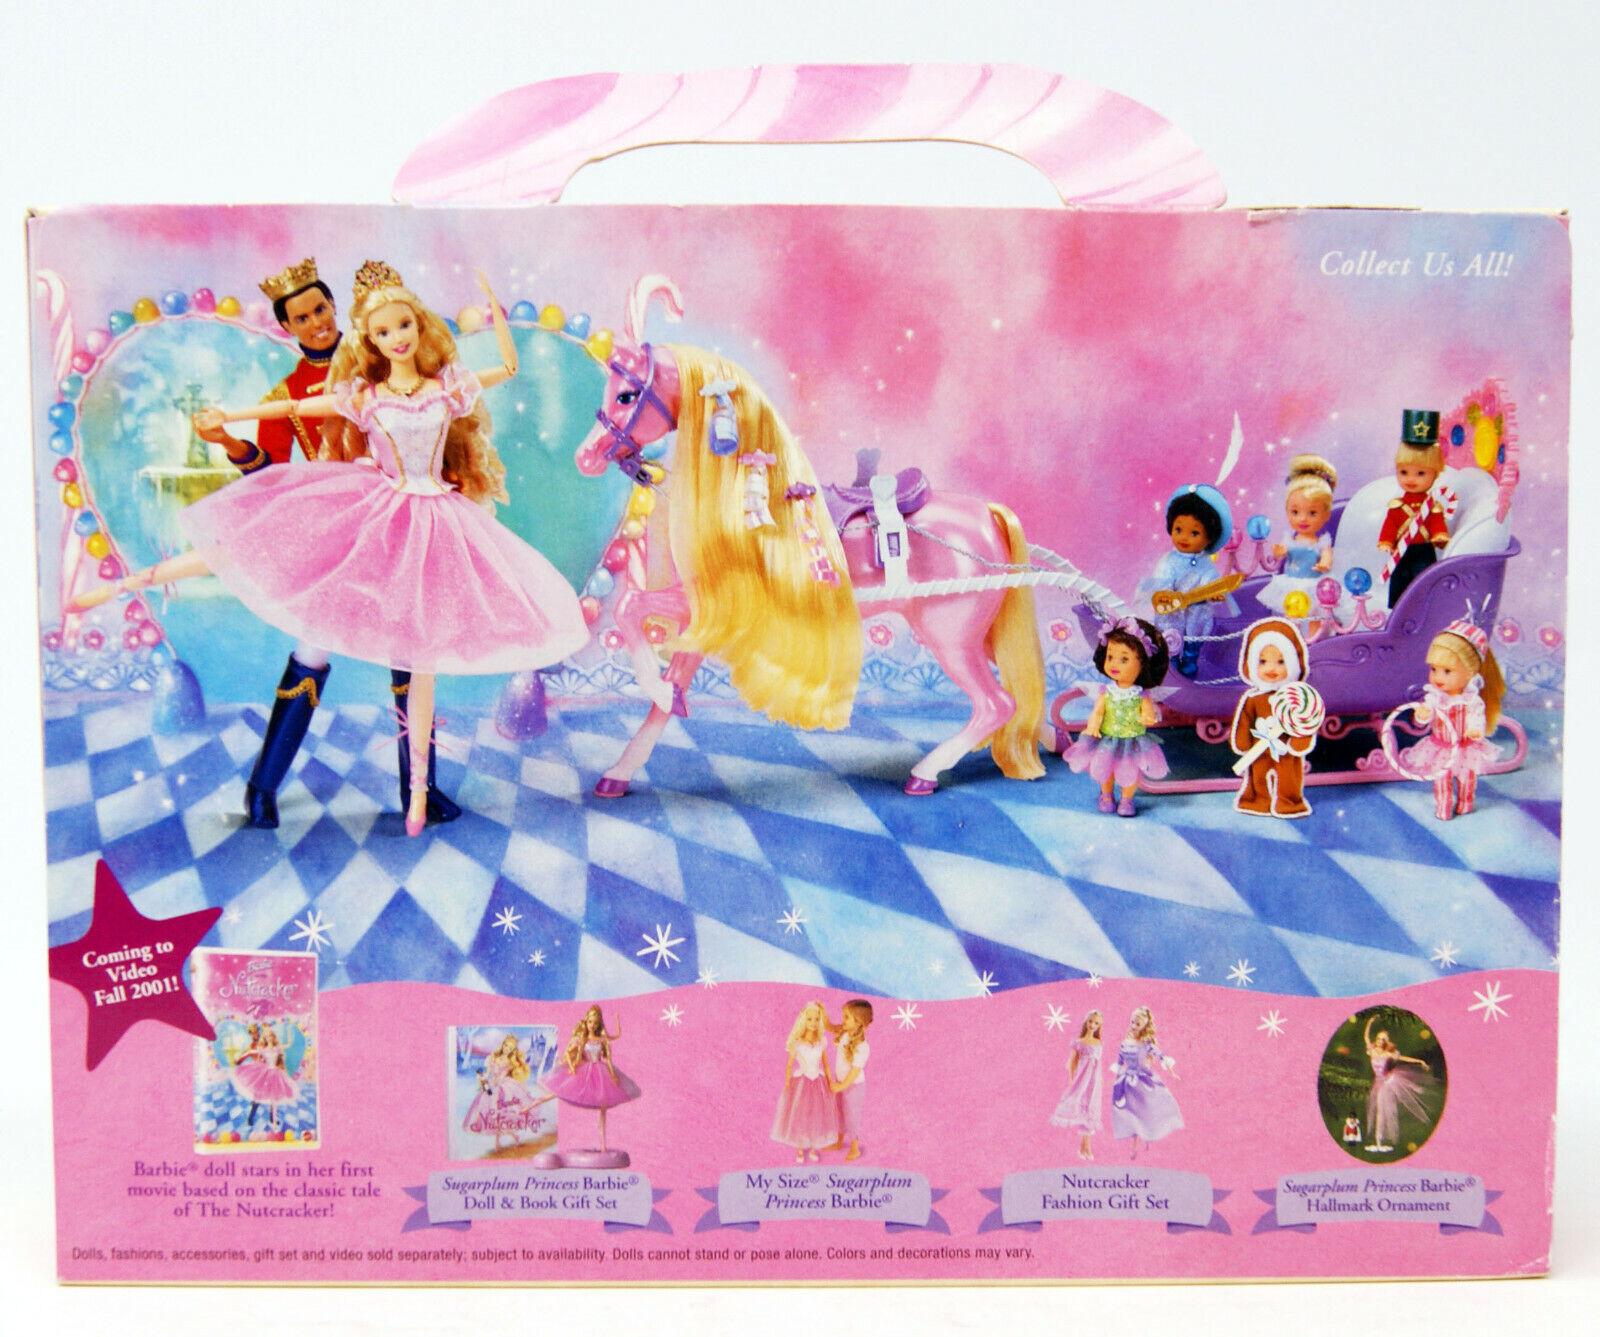 Barbie - Nutcracker - Special Collectible Set - - - Kelly Jenny & Kelly - 2001 d26eb3